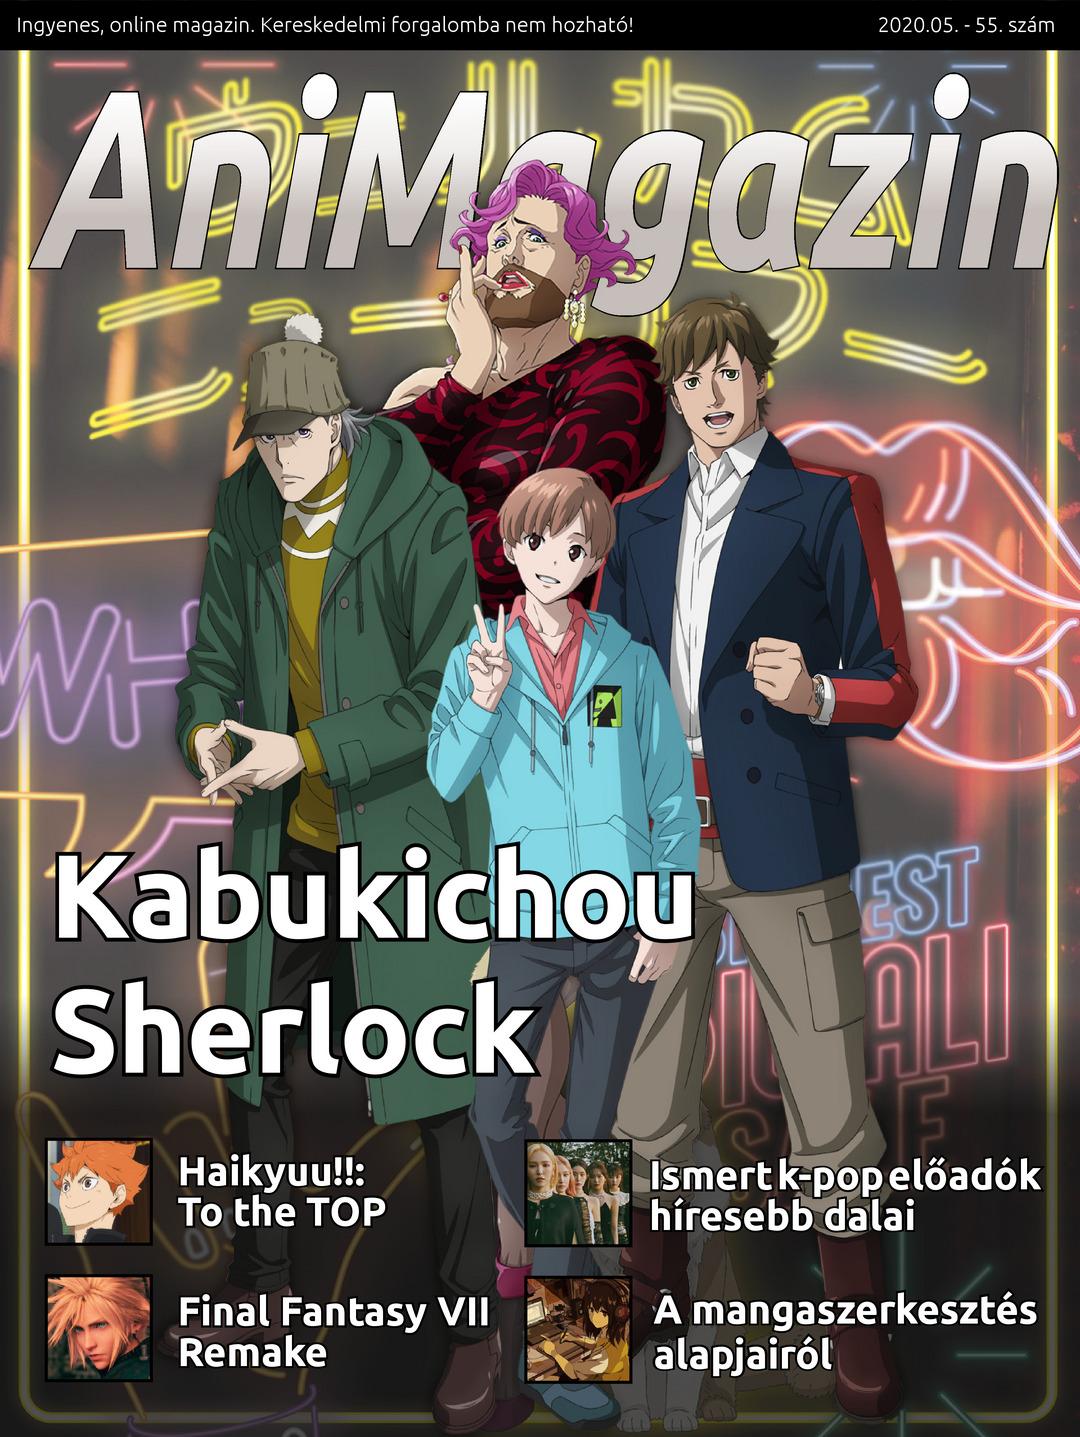 AniMagazin 55 címlap